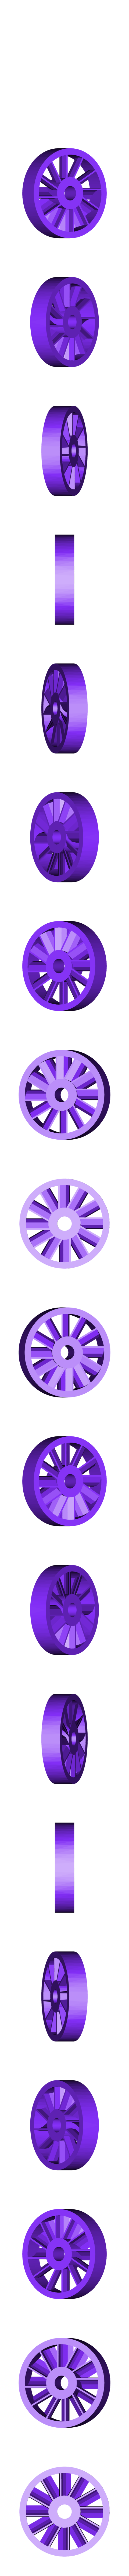 Rotor_Hand-held.STL Download free STL file Turbine Rotary Tool 60,000 rpm • 3D printing object, Jeypera3D